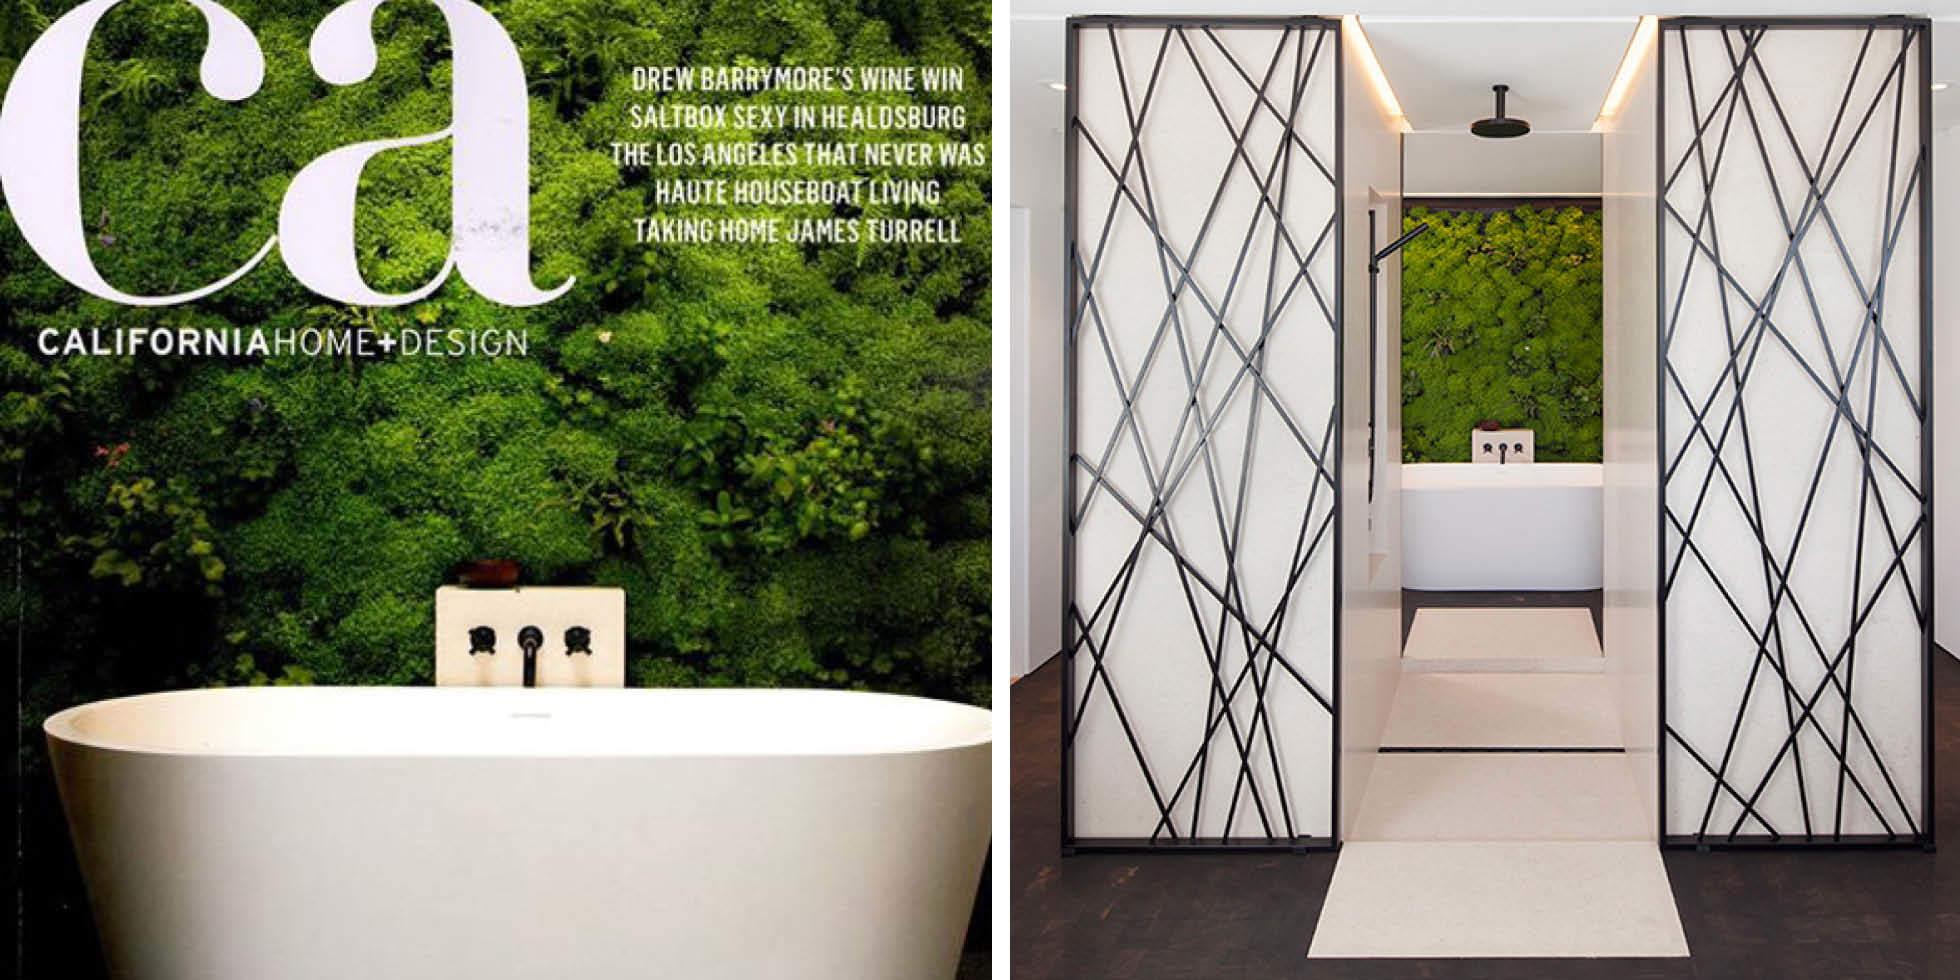 Zen Bathroom Escape Living Wall by Habitat Horticulture - View 2